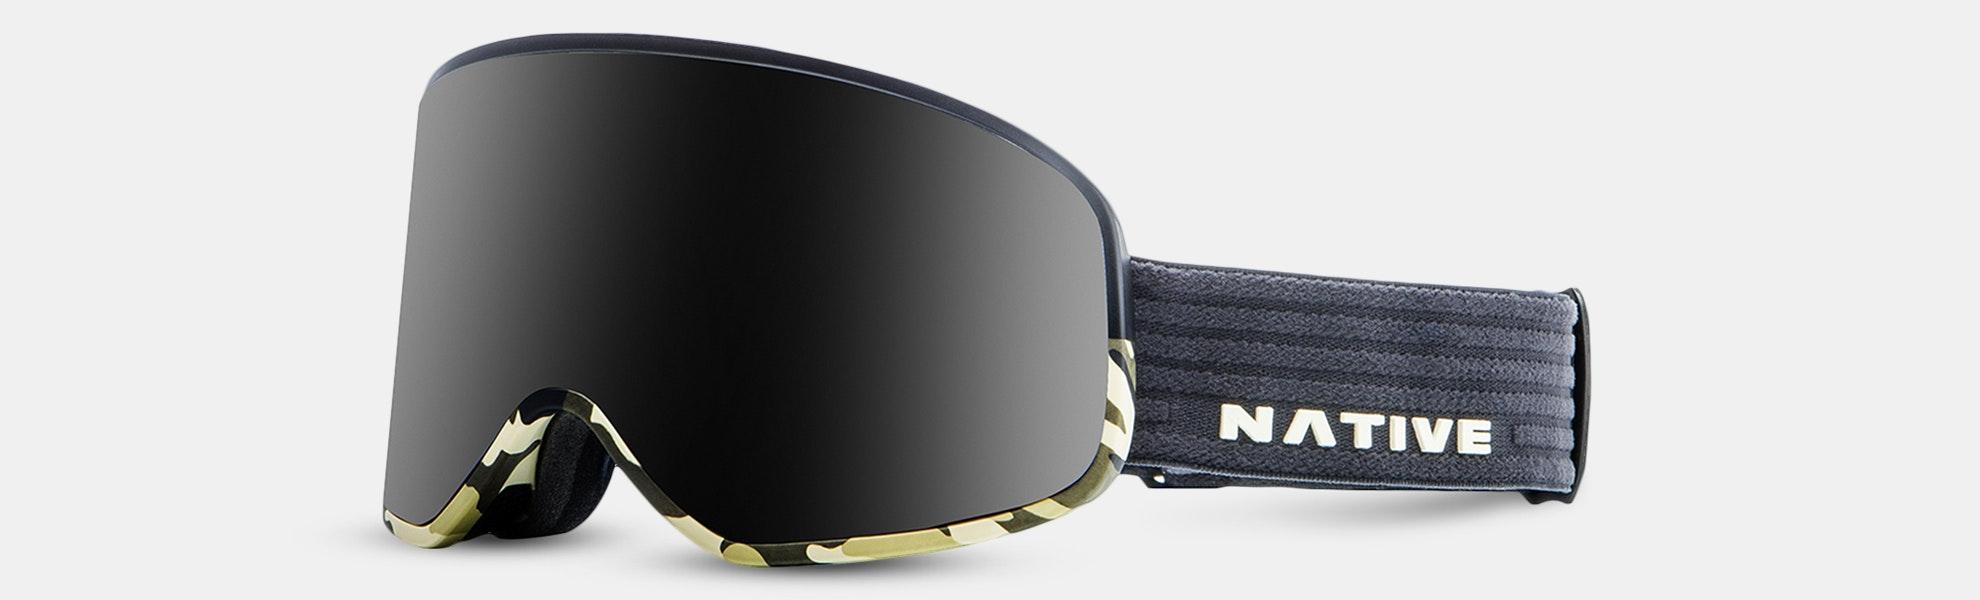 Native Eyewear Tenmile Goggles